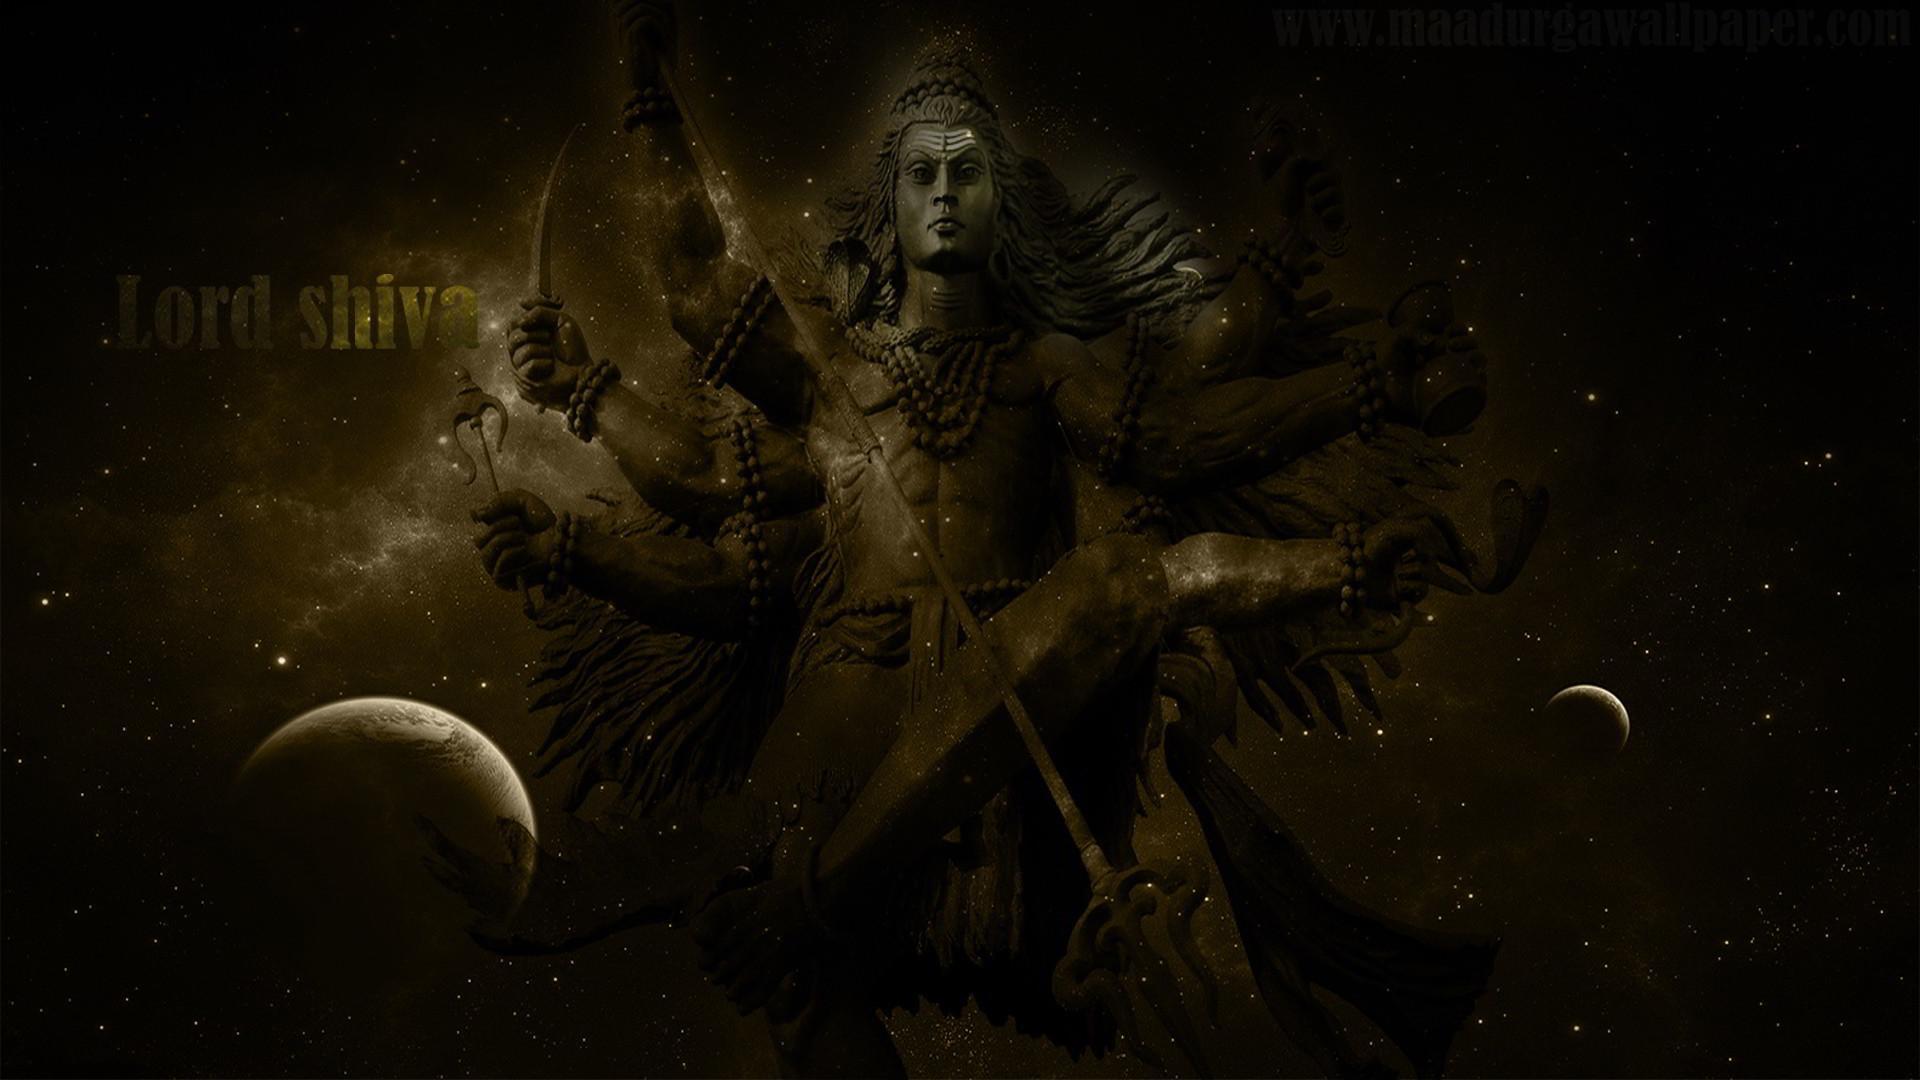 Shiva 4k Wallpapers Wallpaper Cave